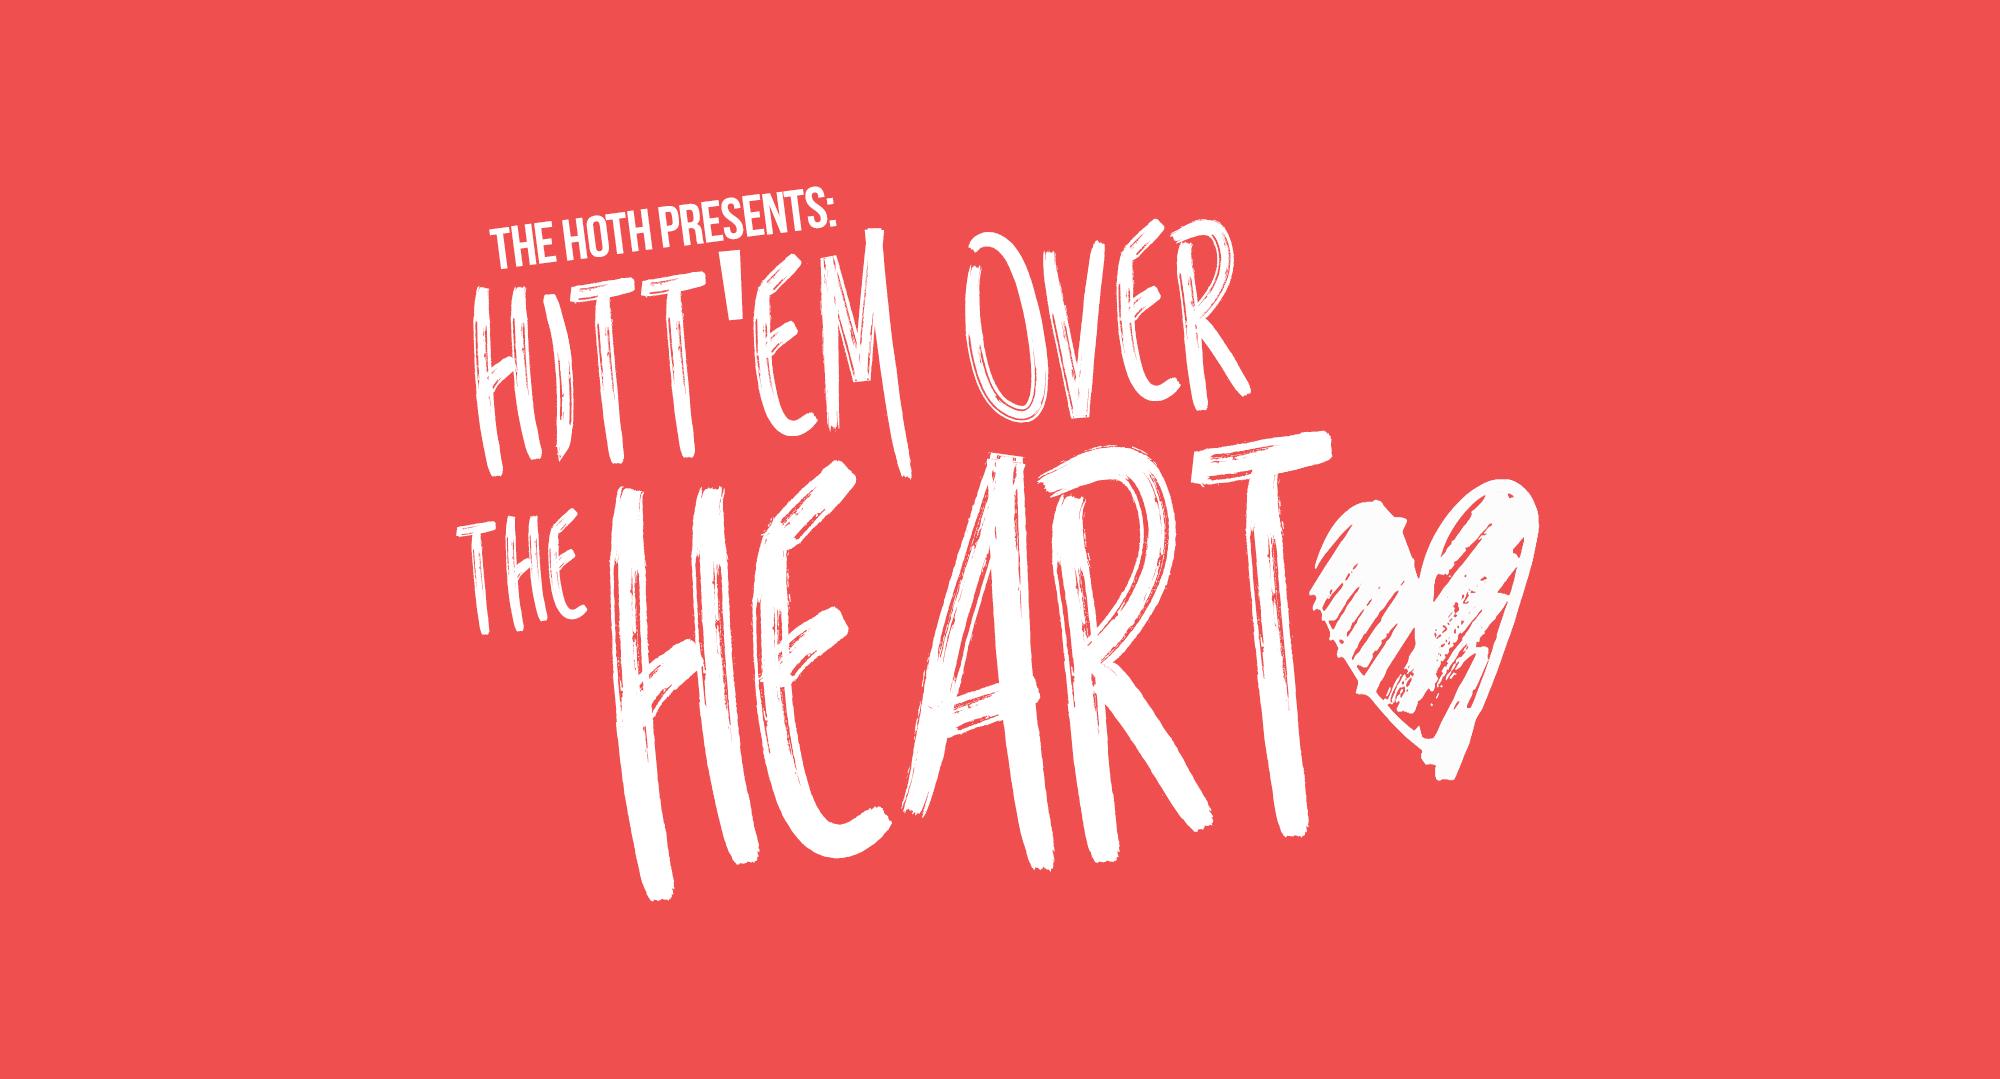 The HOTH Hitt'em Over The Heart Award: Charity & Philanthropy